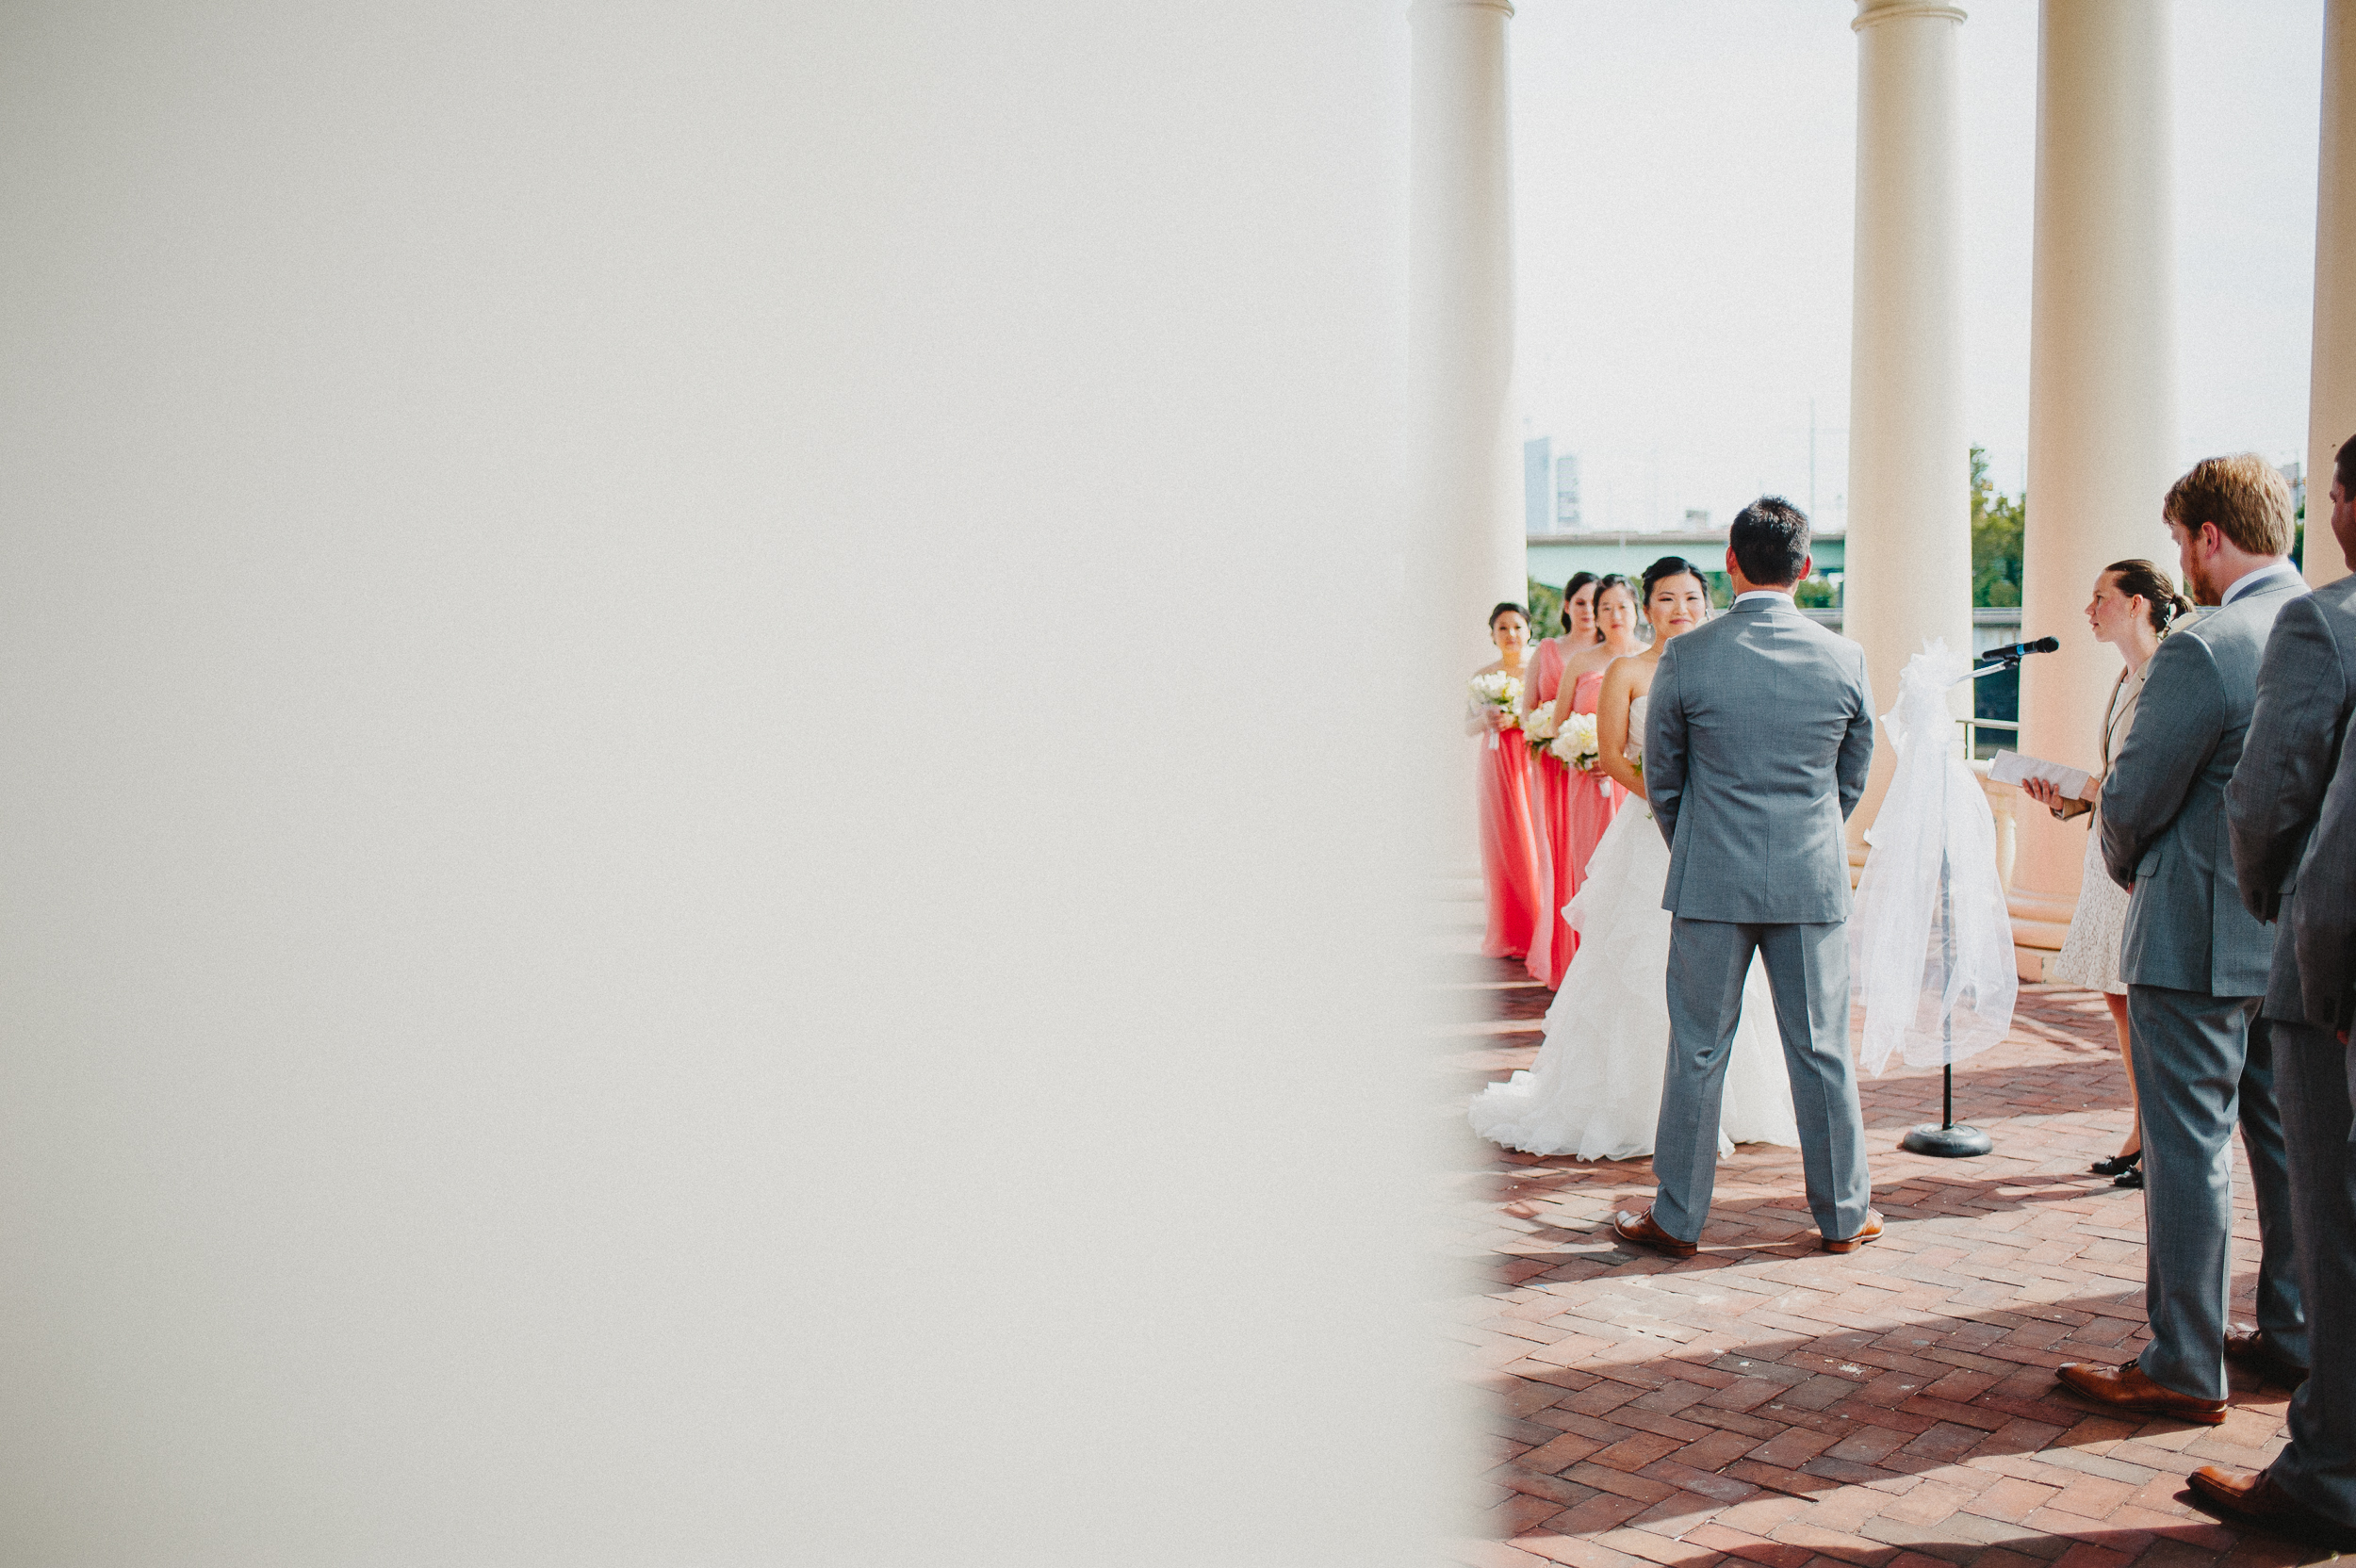 union-trust-philadelphia-wedding-photographer-40.jpg